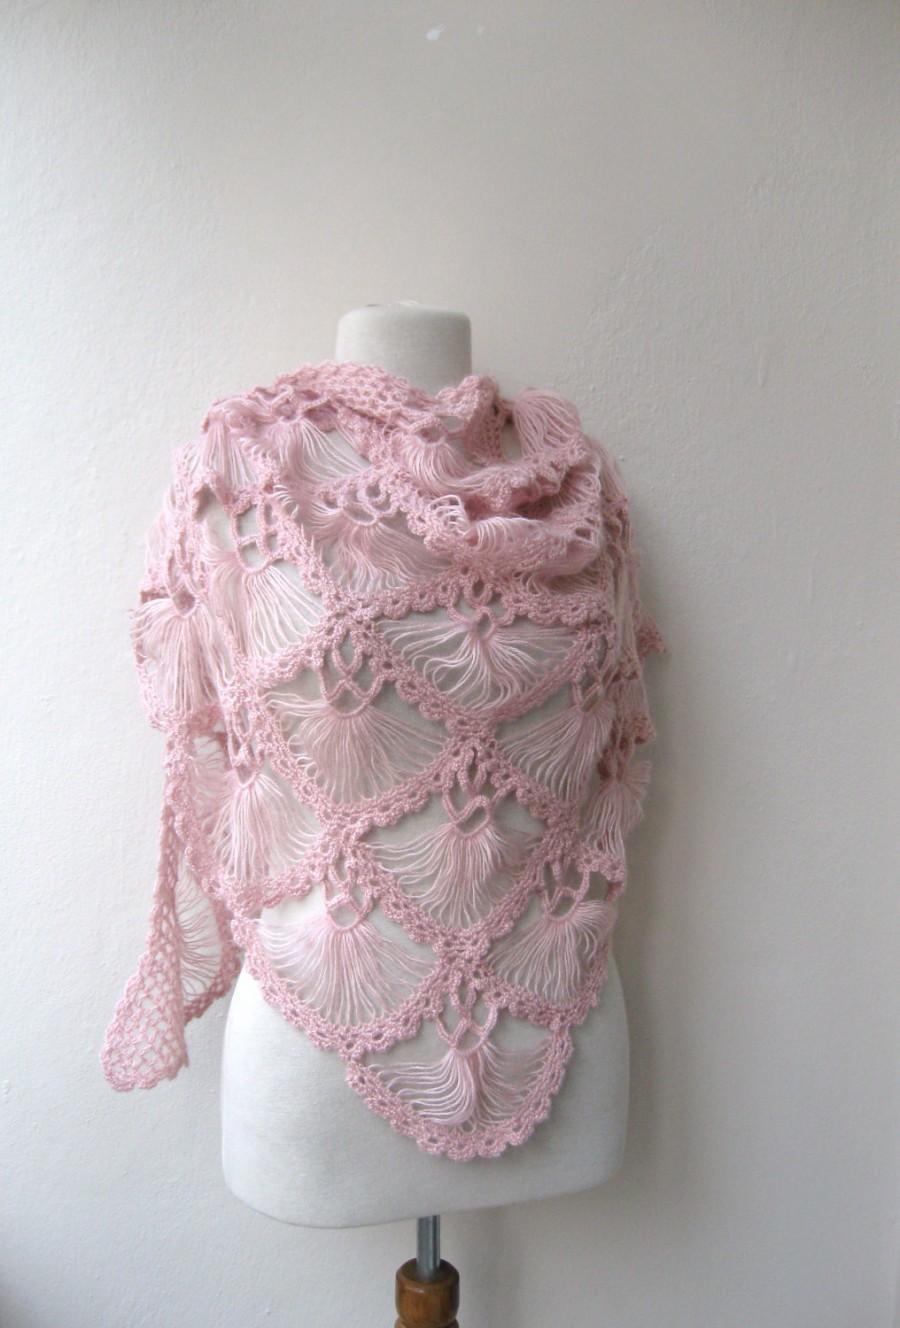 زفاف - Hand crochet triangle lace shawl wrap in PINK Holiday Valentine Wedding Bride Bridesmaid - ready to ship